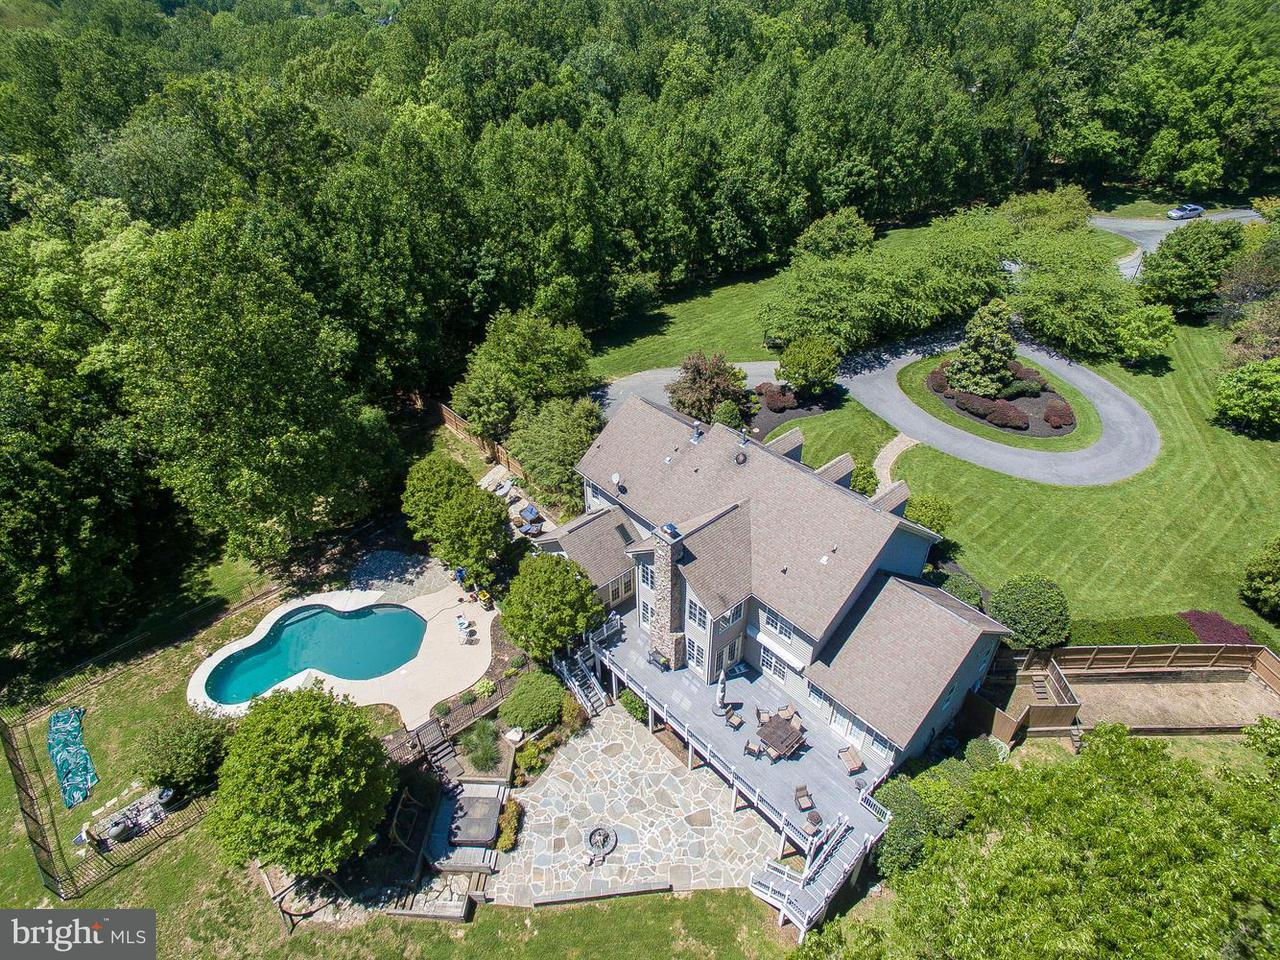 Single Family Home for Sale at 9136 GOSHEN PARK Place 9136 GOSHEN PARK Place Gaithersburg, Maryland 20882 United States